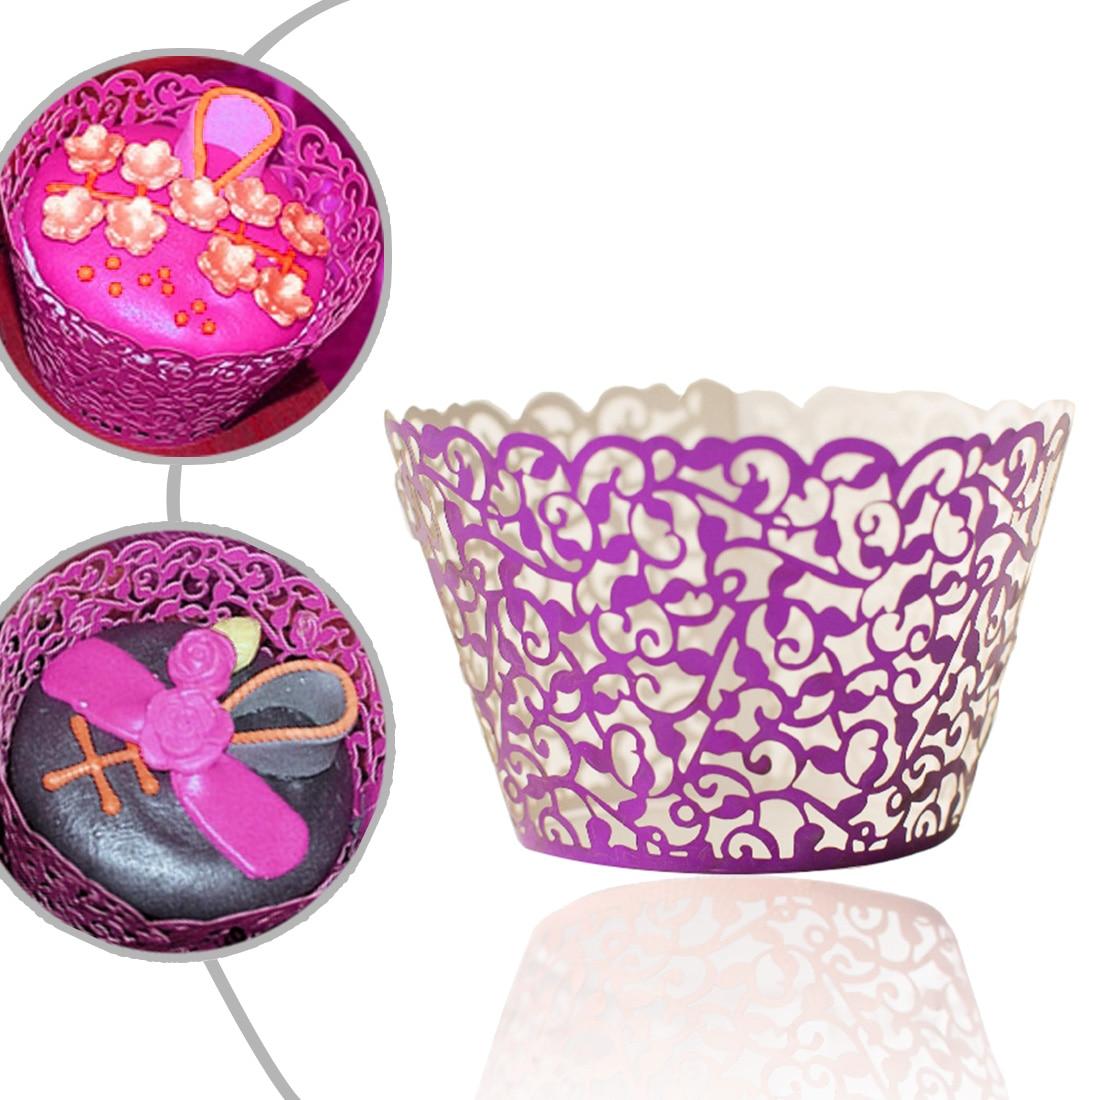 Top Fashion 12Pcs Hollow Decoration Wedding Filigree Vintage Cupcake Wrappers Wraps Case Gold Card